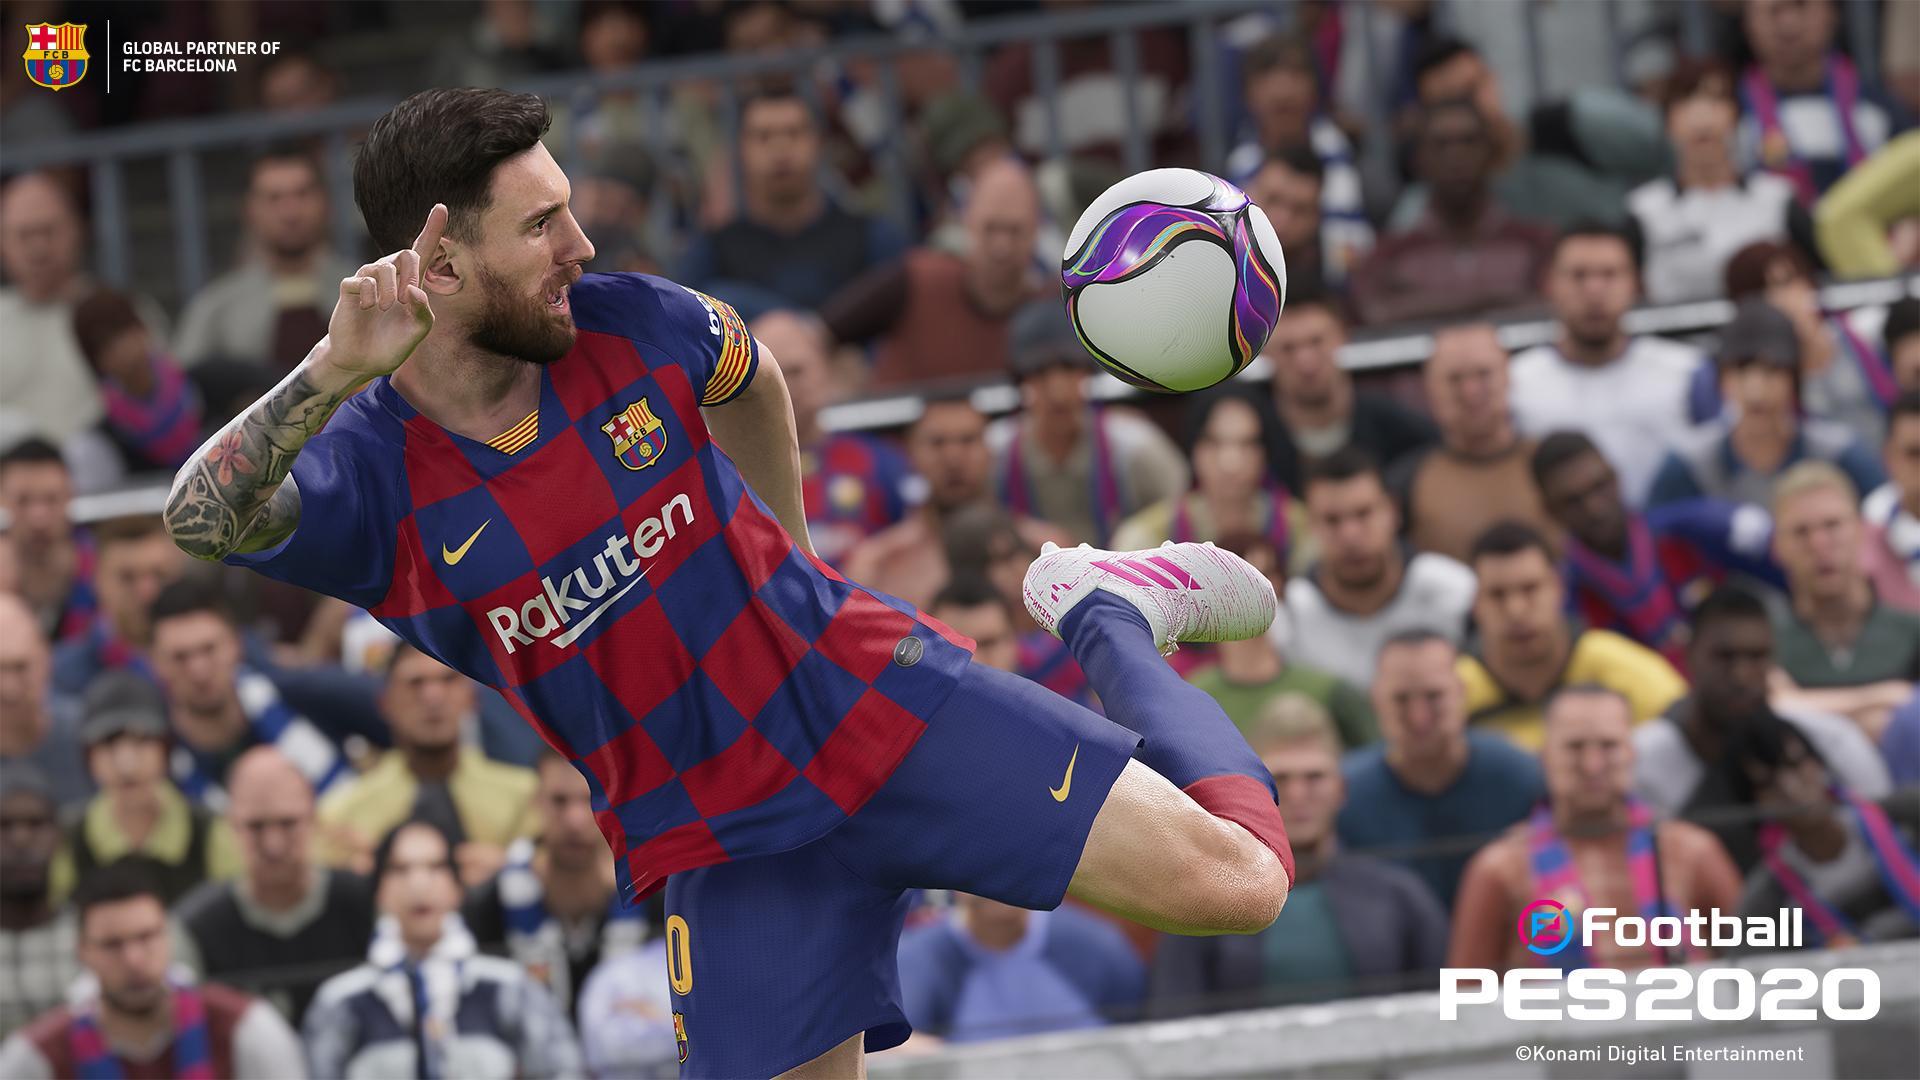 barcelona pes 2020 teams database stats pro evolution soccer 2020 efootball database barcelona pes 2020 teams database